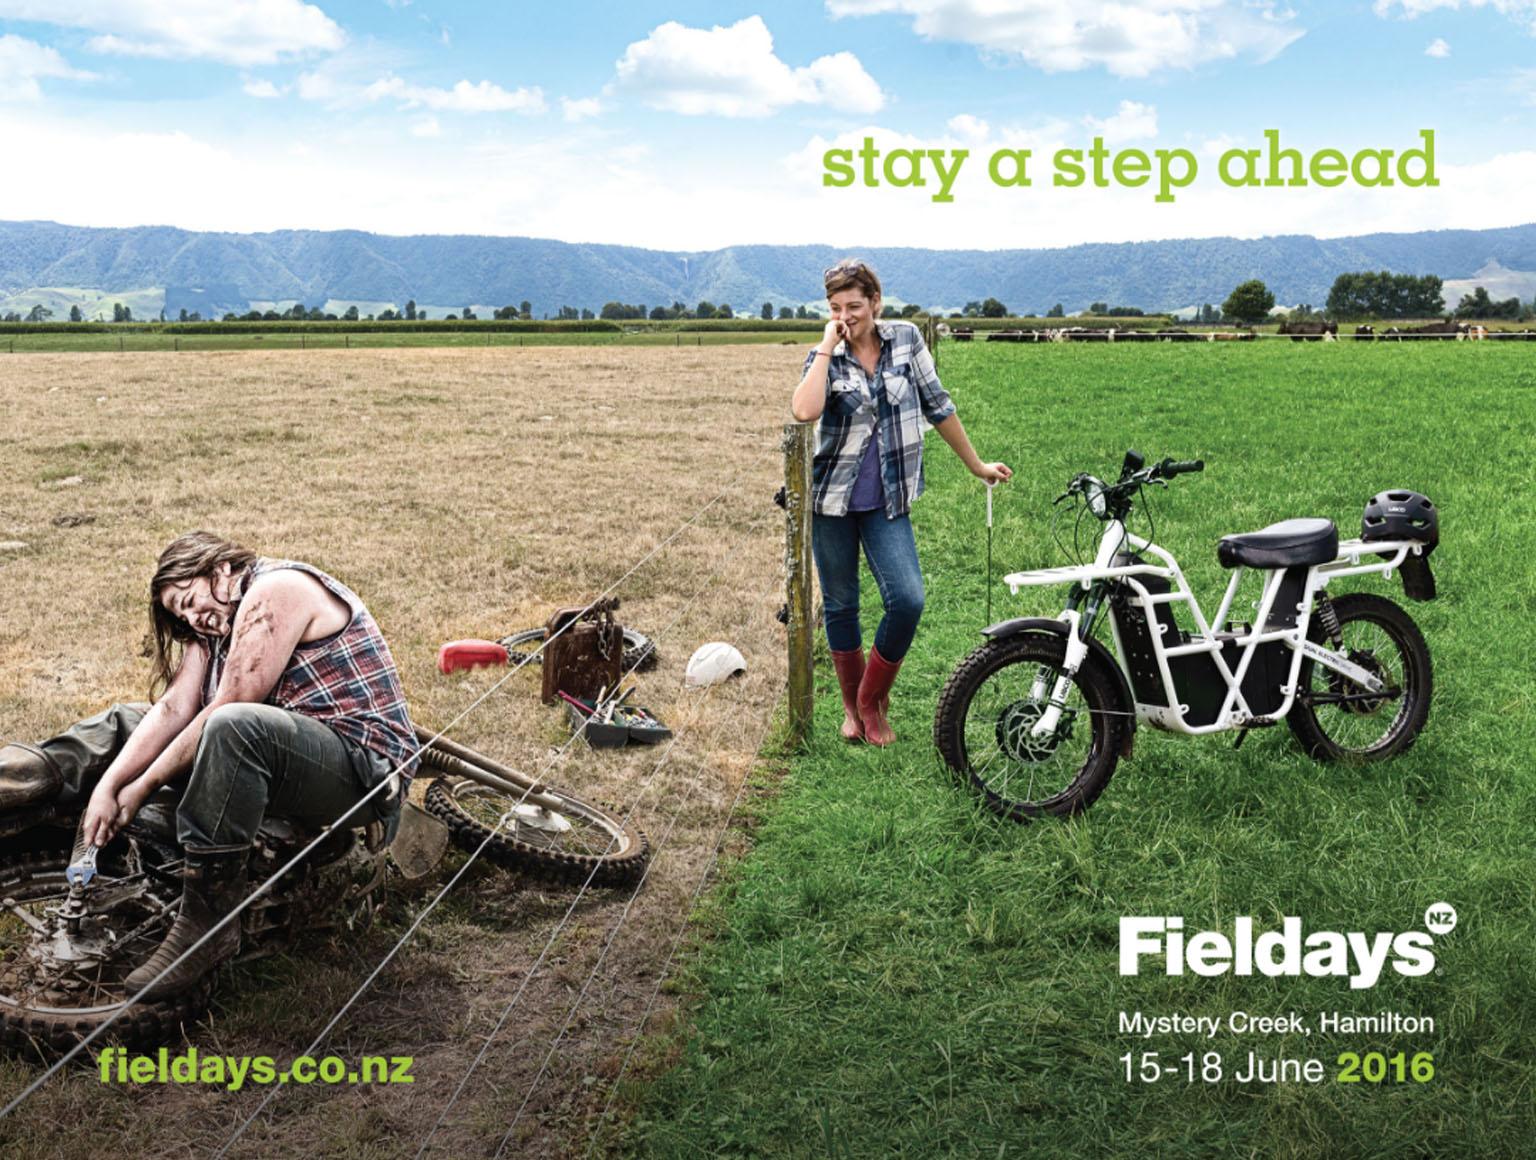 Fieldays 2016 image ad